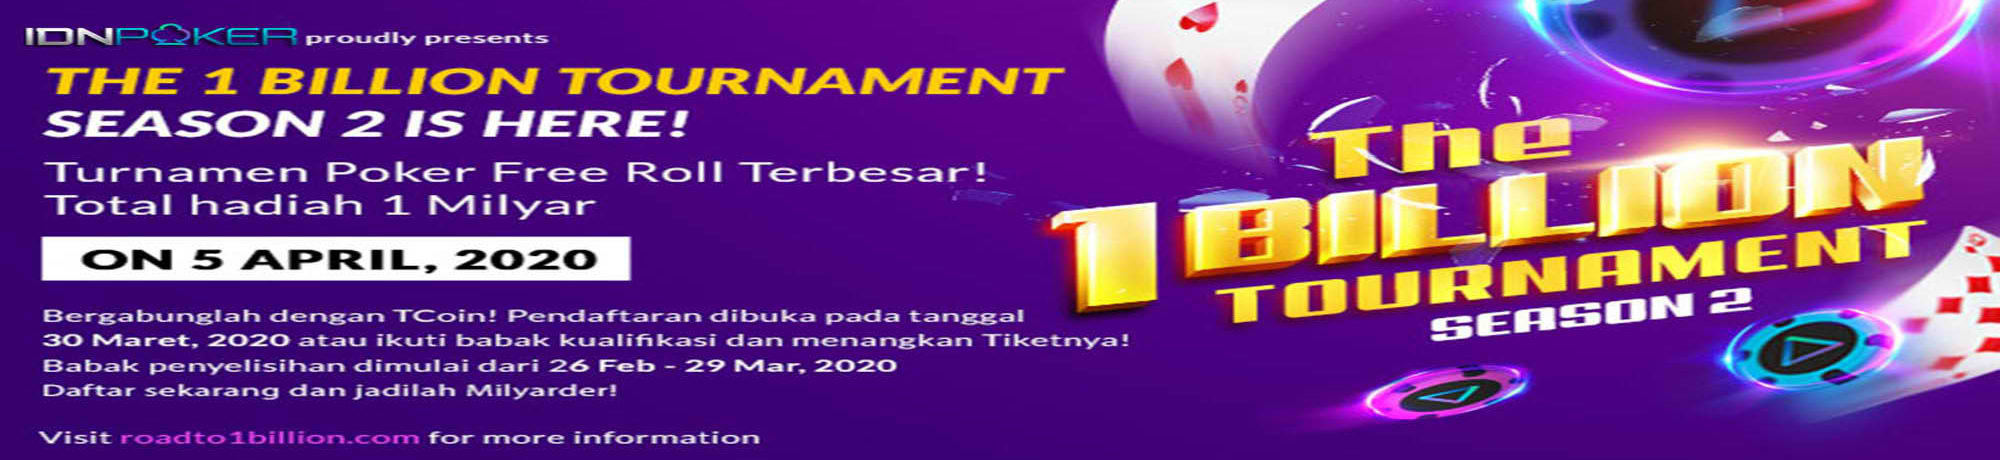 season-2-idnpoker-2000x460-1